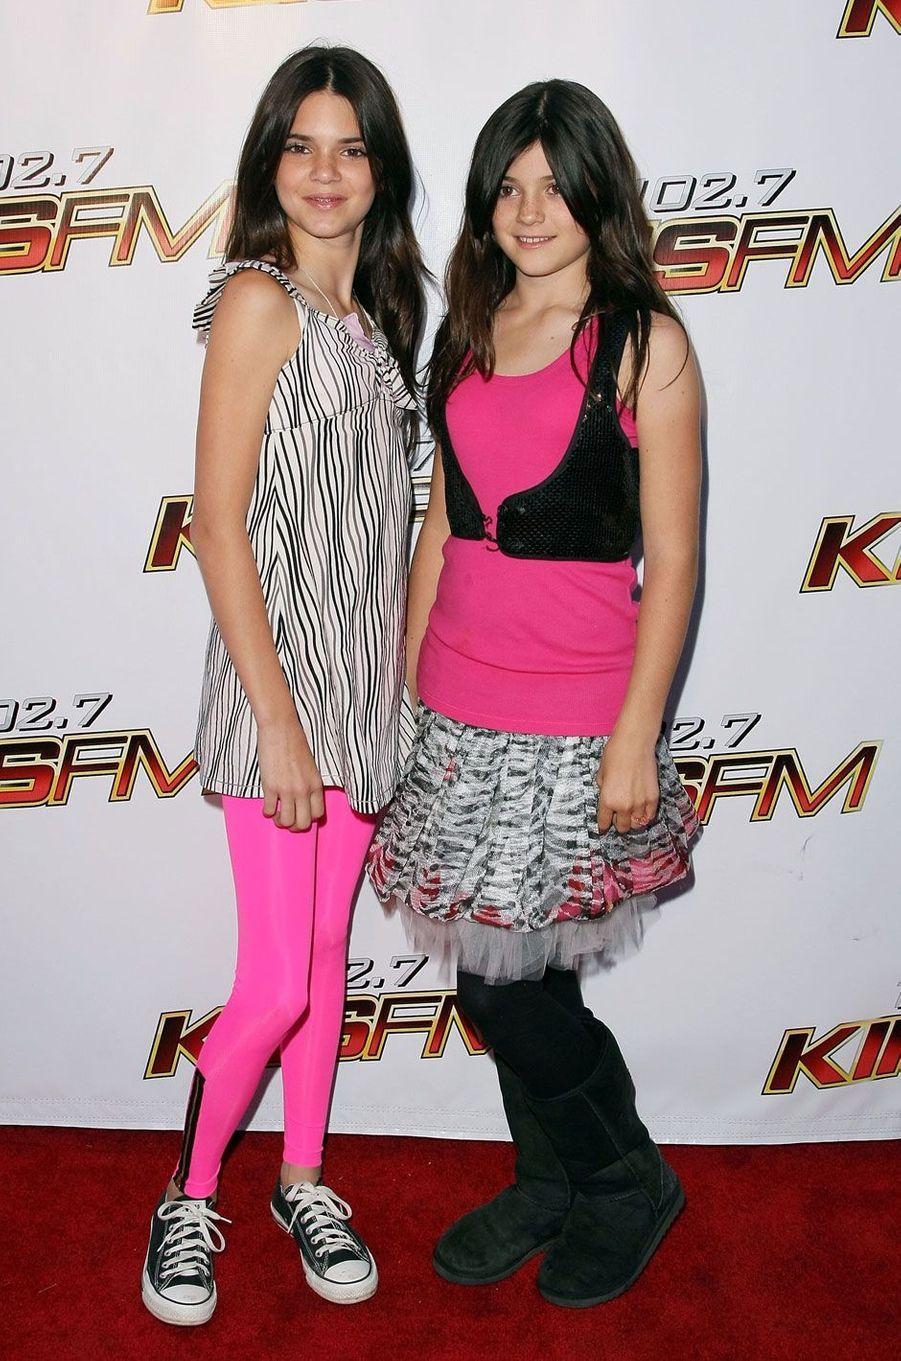 Kylie et Kendall Jenner en mai 2008.